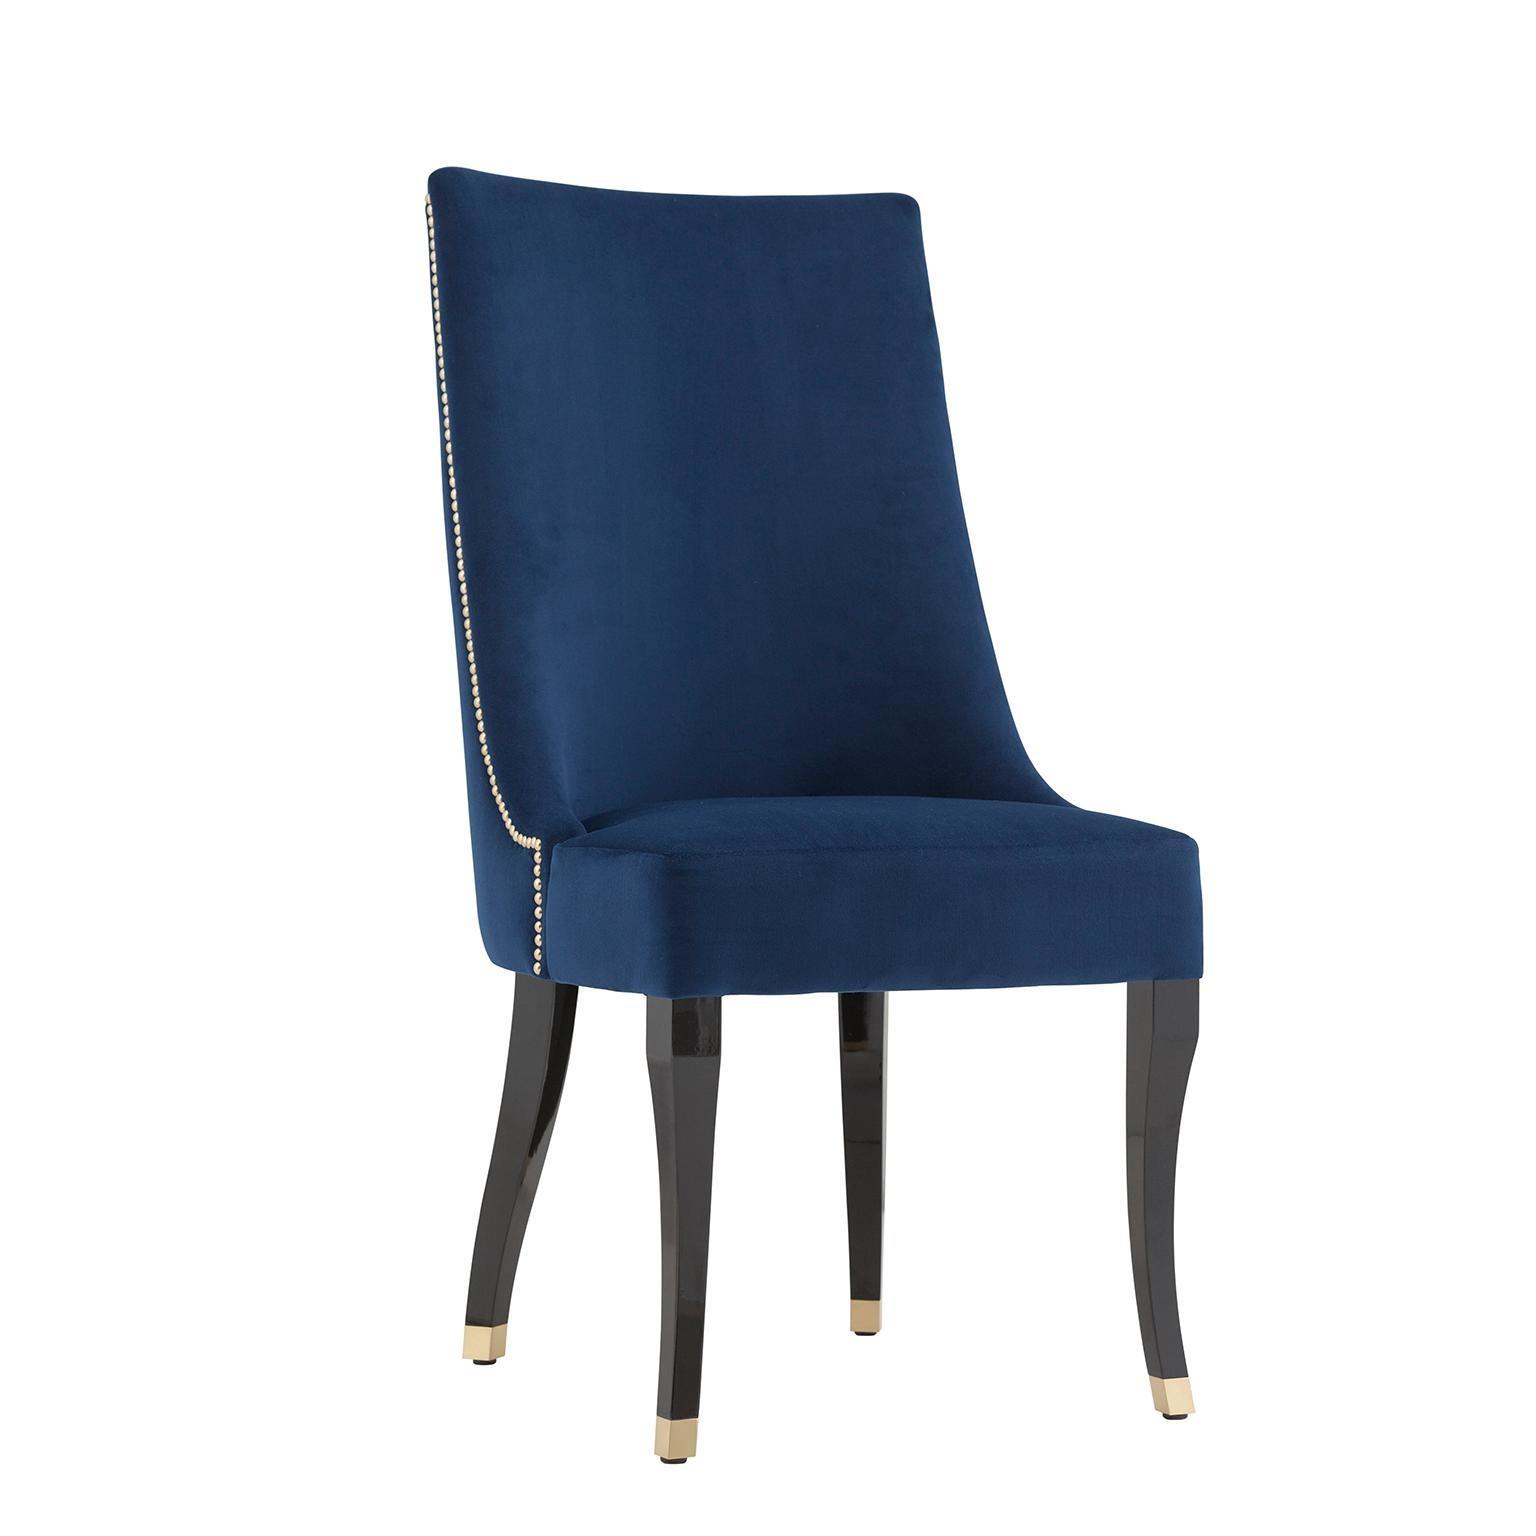 Plathea Chair Blue Velvet Gold Tacks Beech Black Stain Brass Leg End Caps